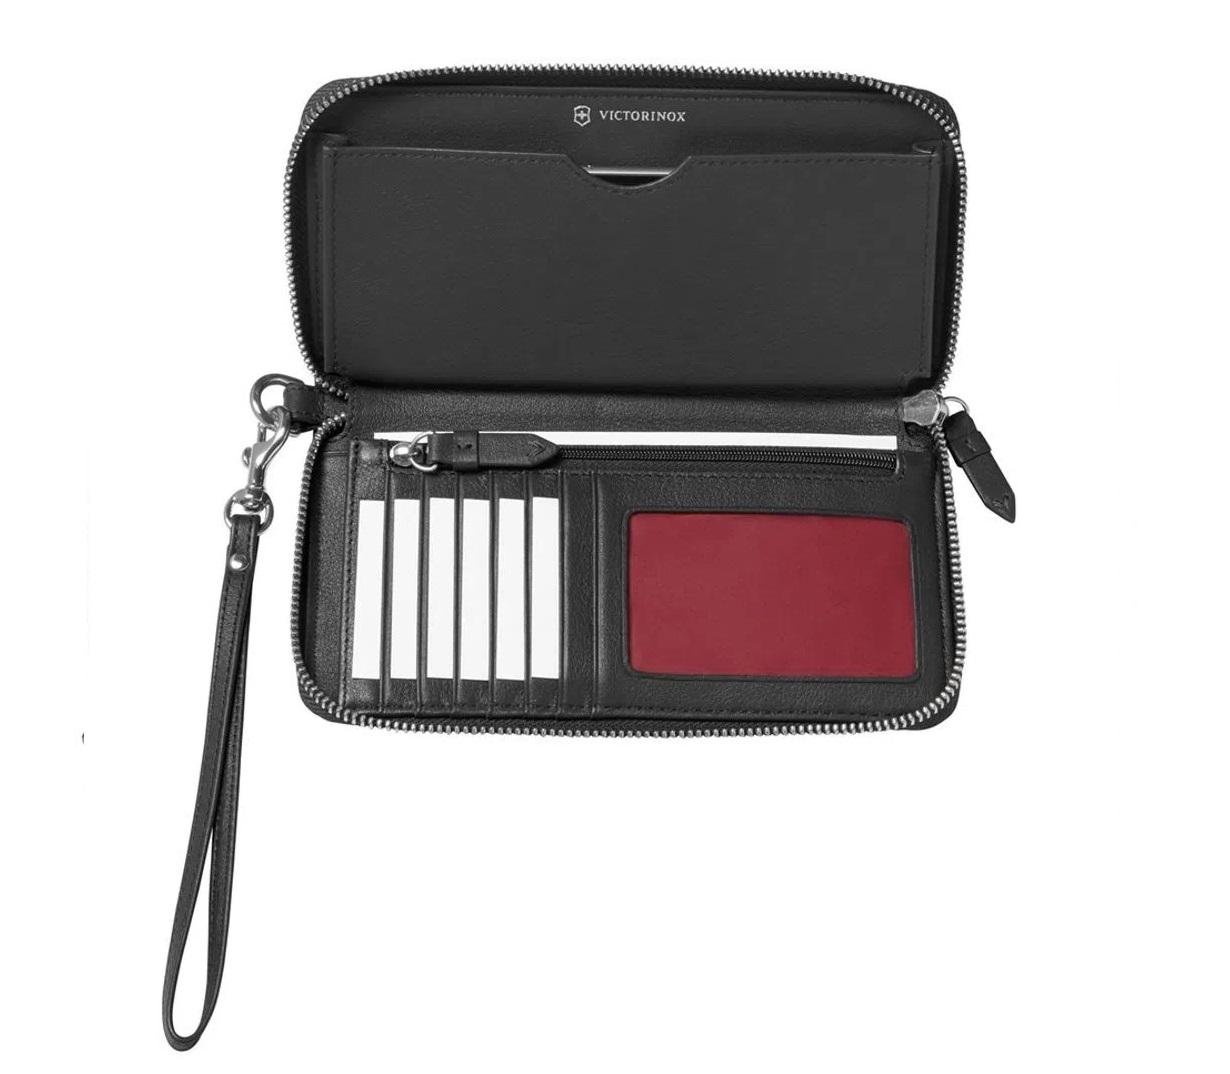 Carteira feminina Smartphone Wristlet Victoria 2.0 Victorinox 606697  - Mix Eletro